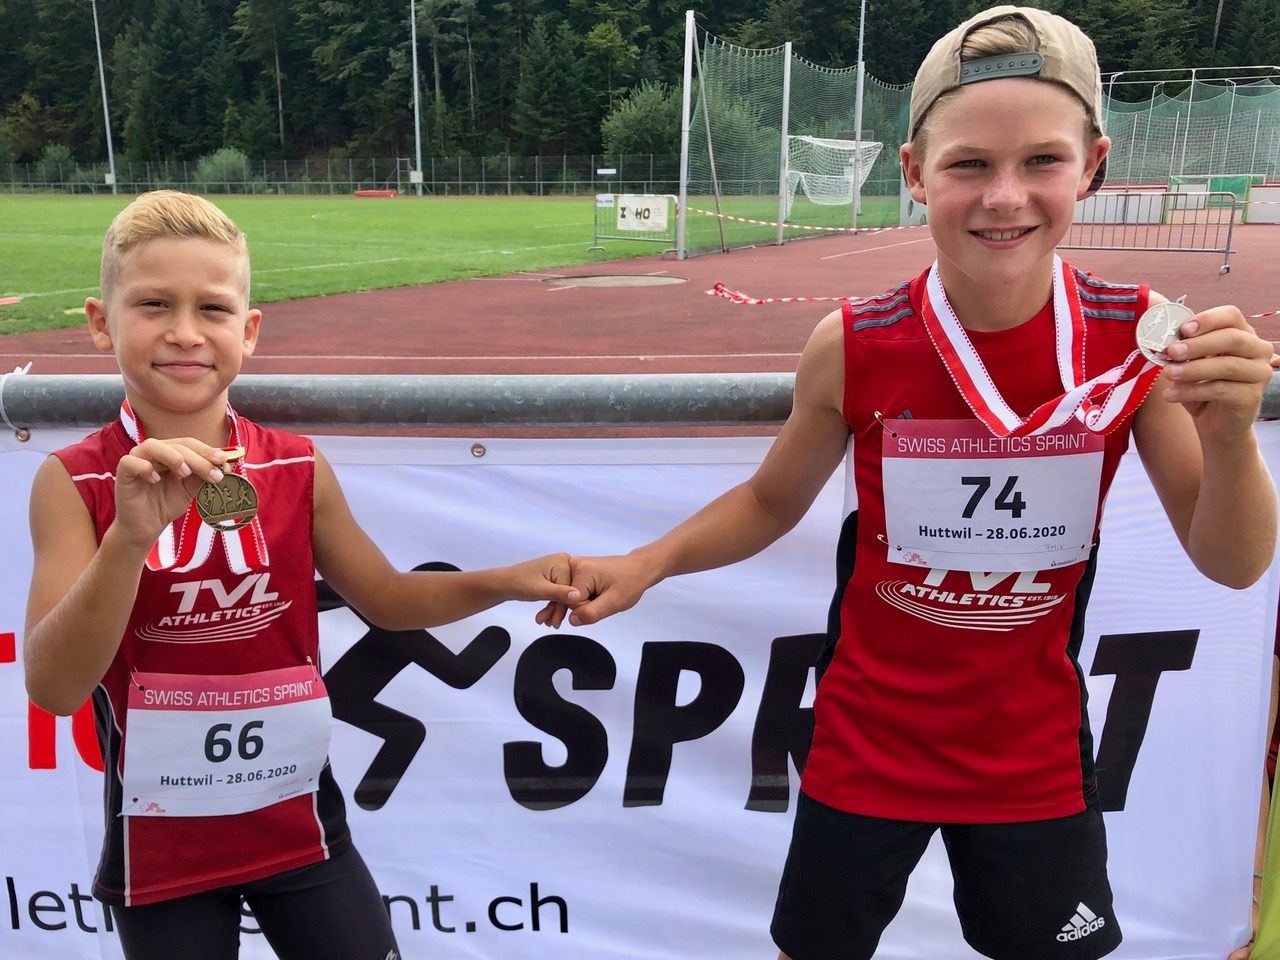 Bericht – Swiss Athletics Sprint Kantonalfinal 2020 Huttwil